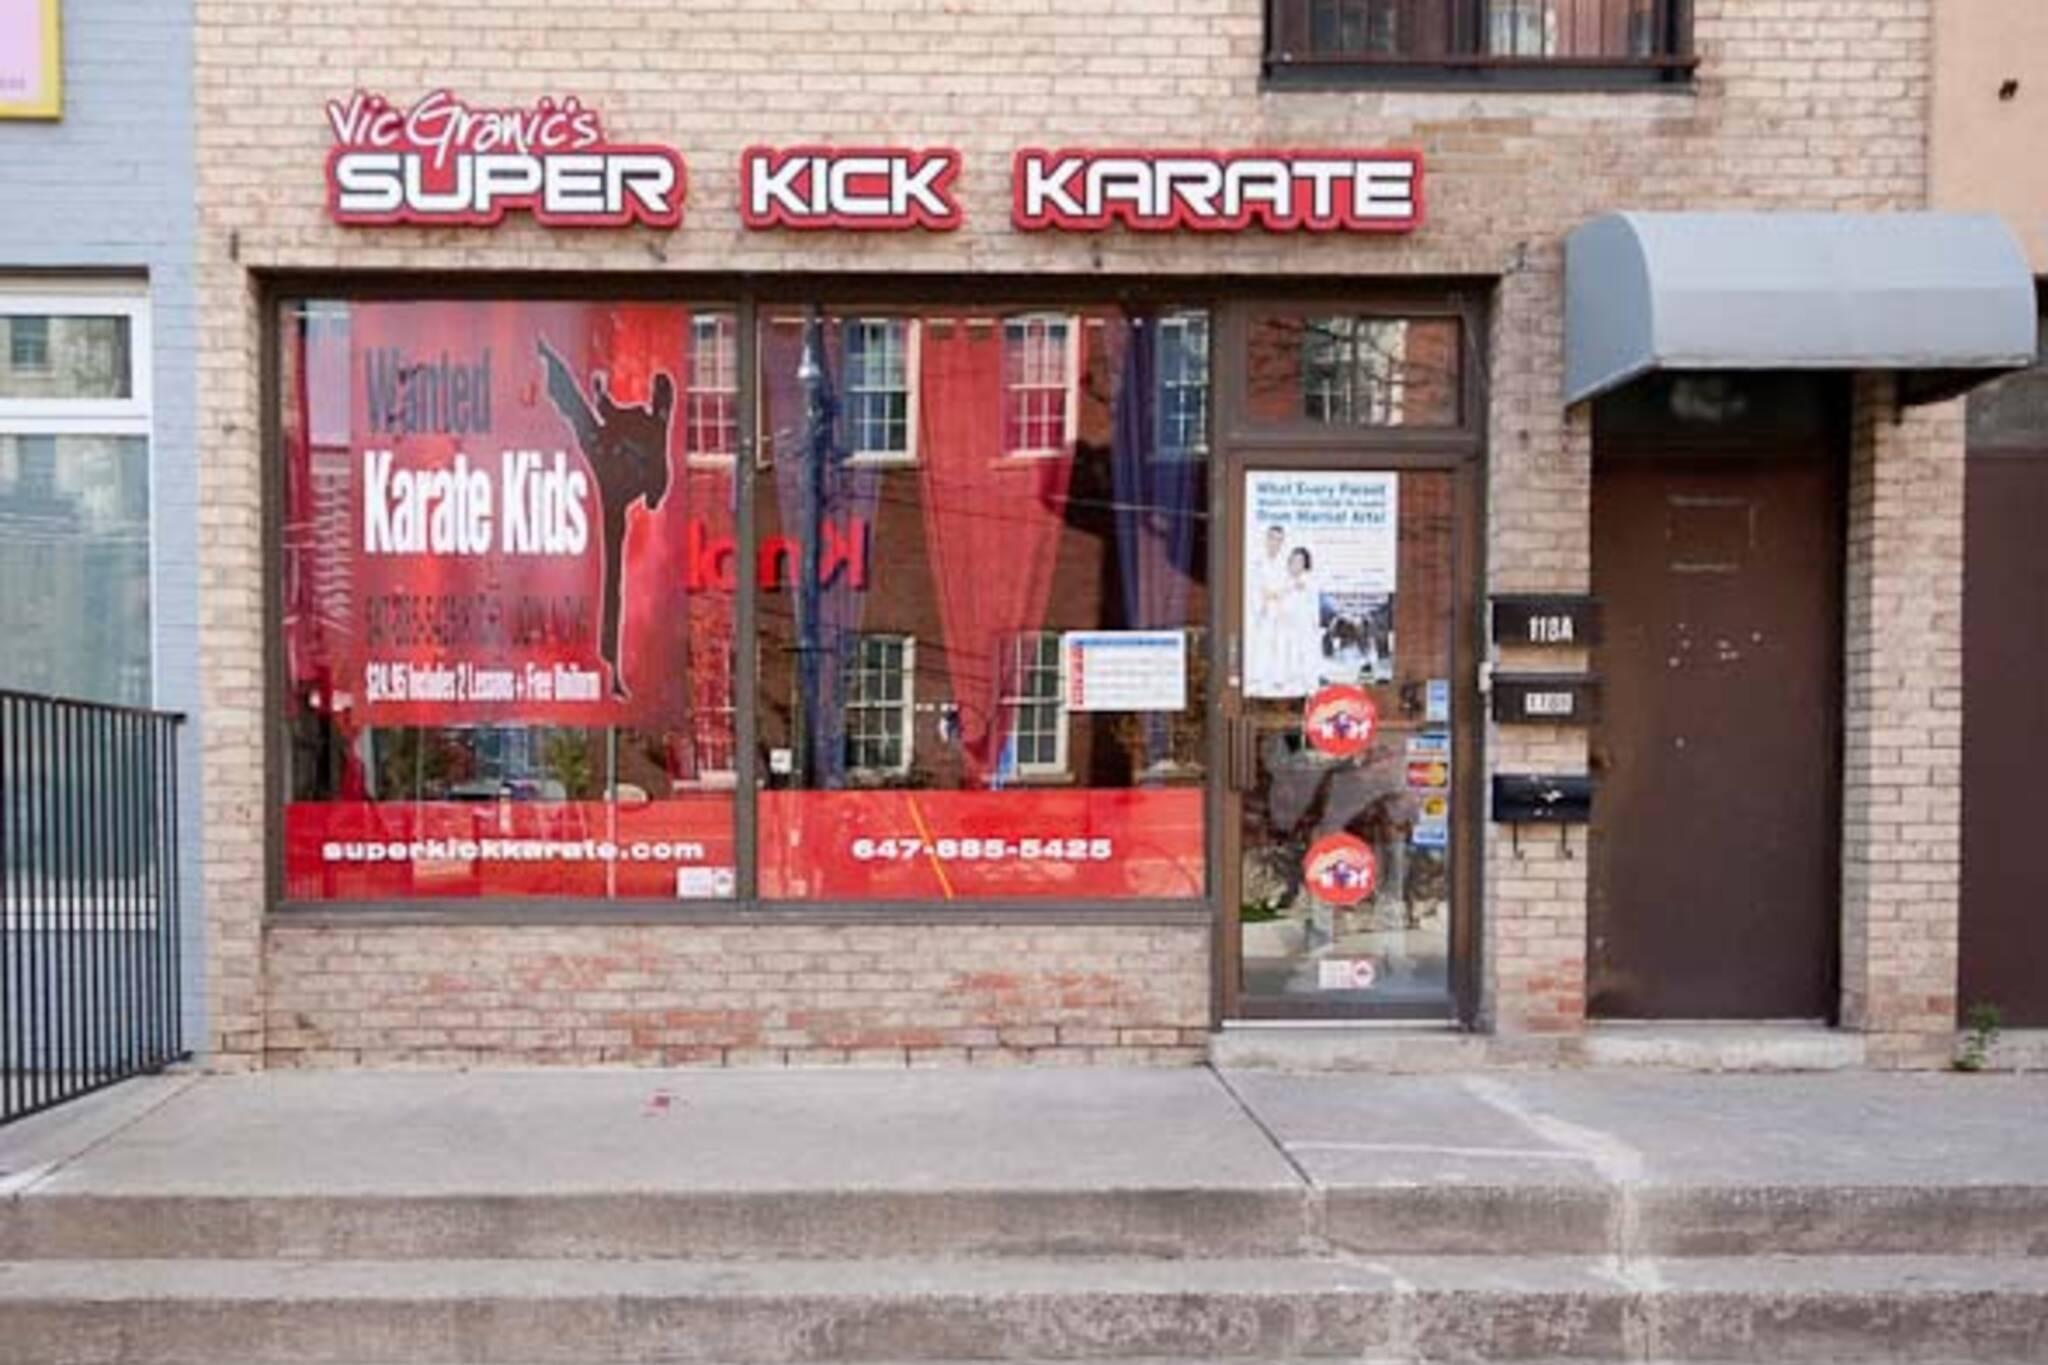 Super Kick Karate